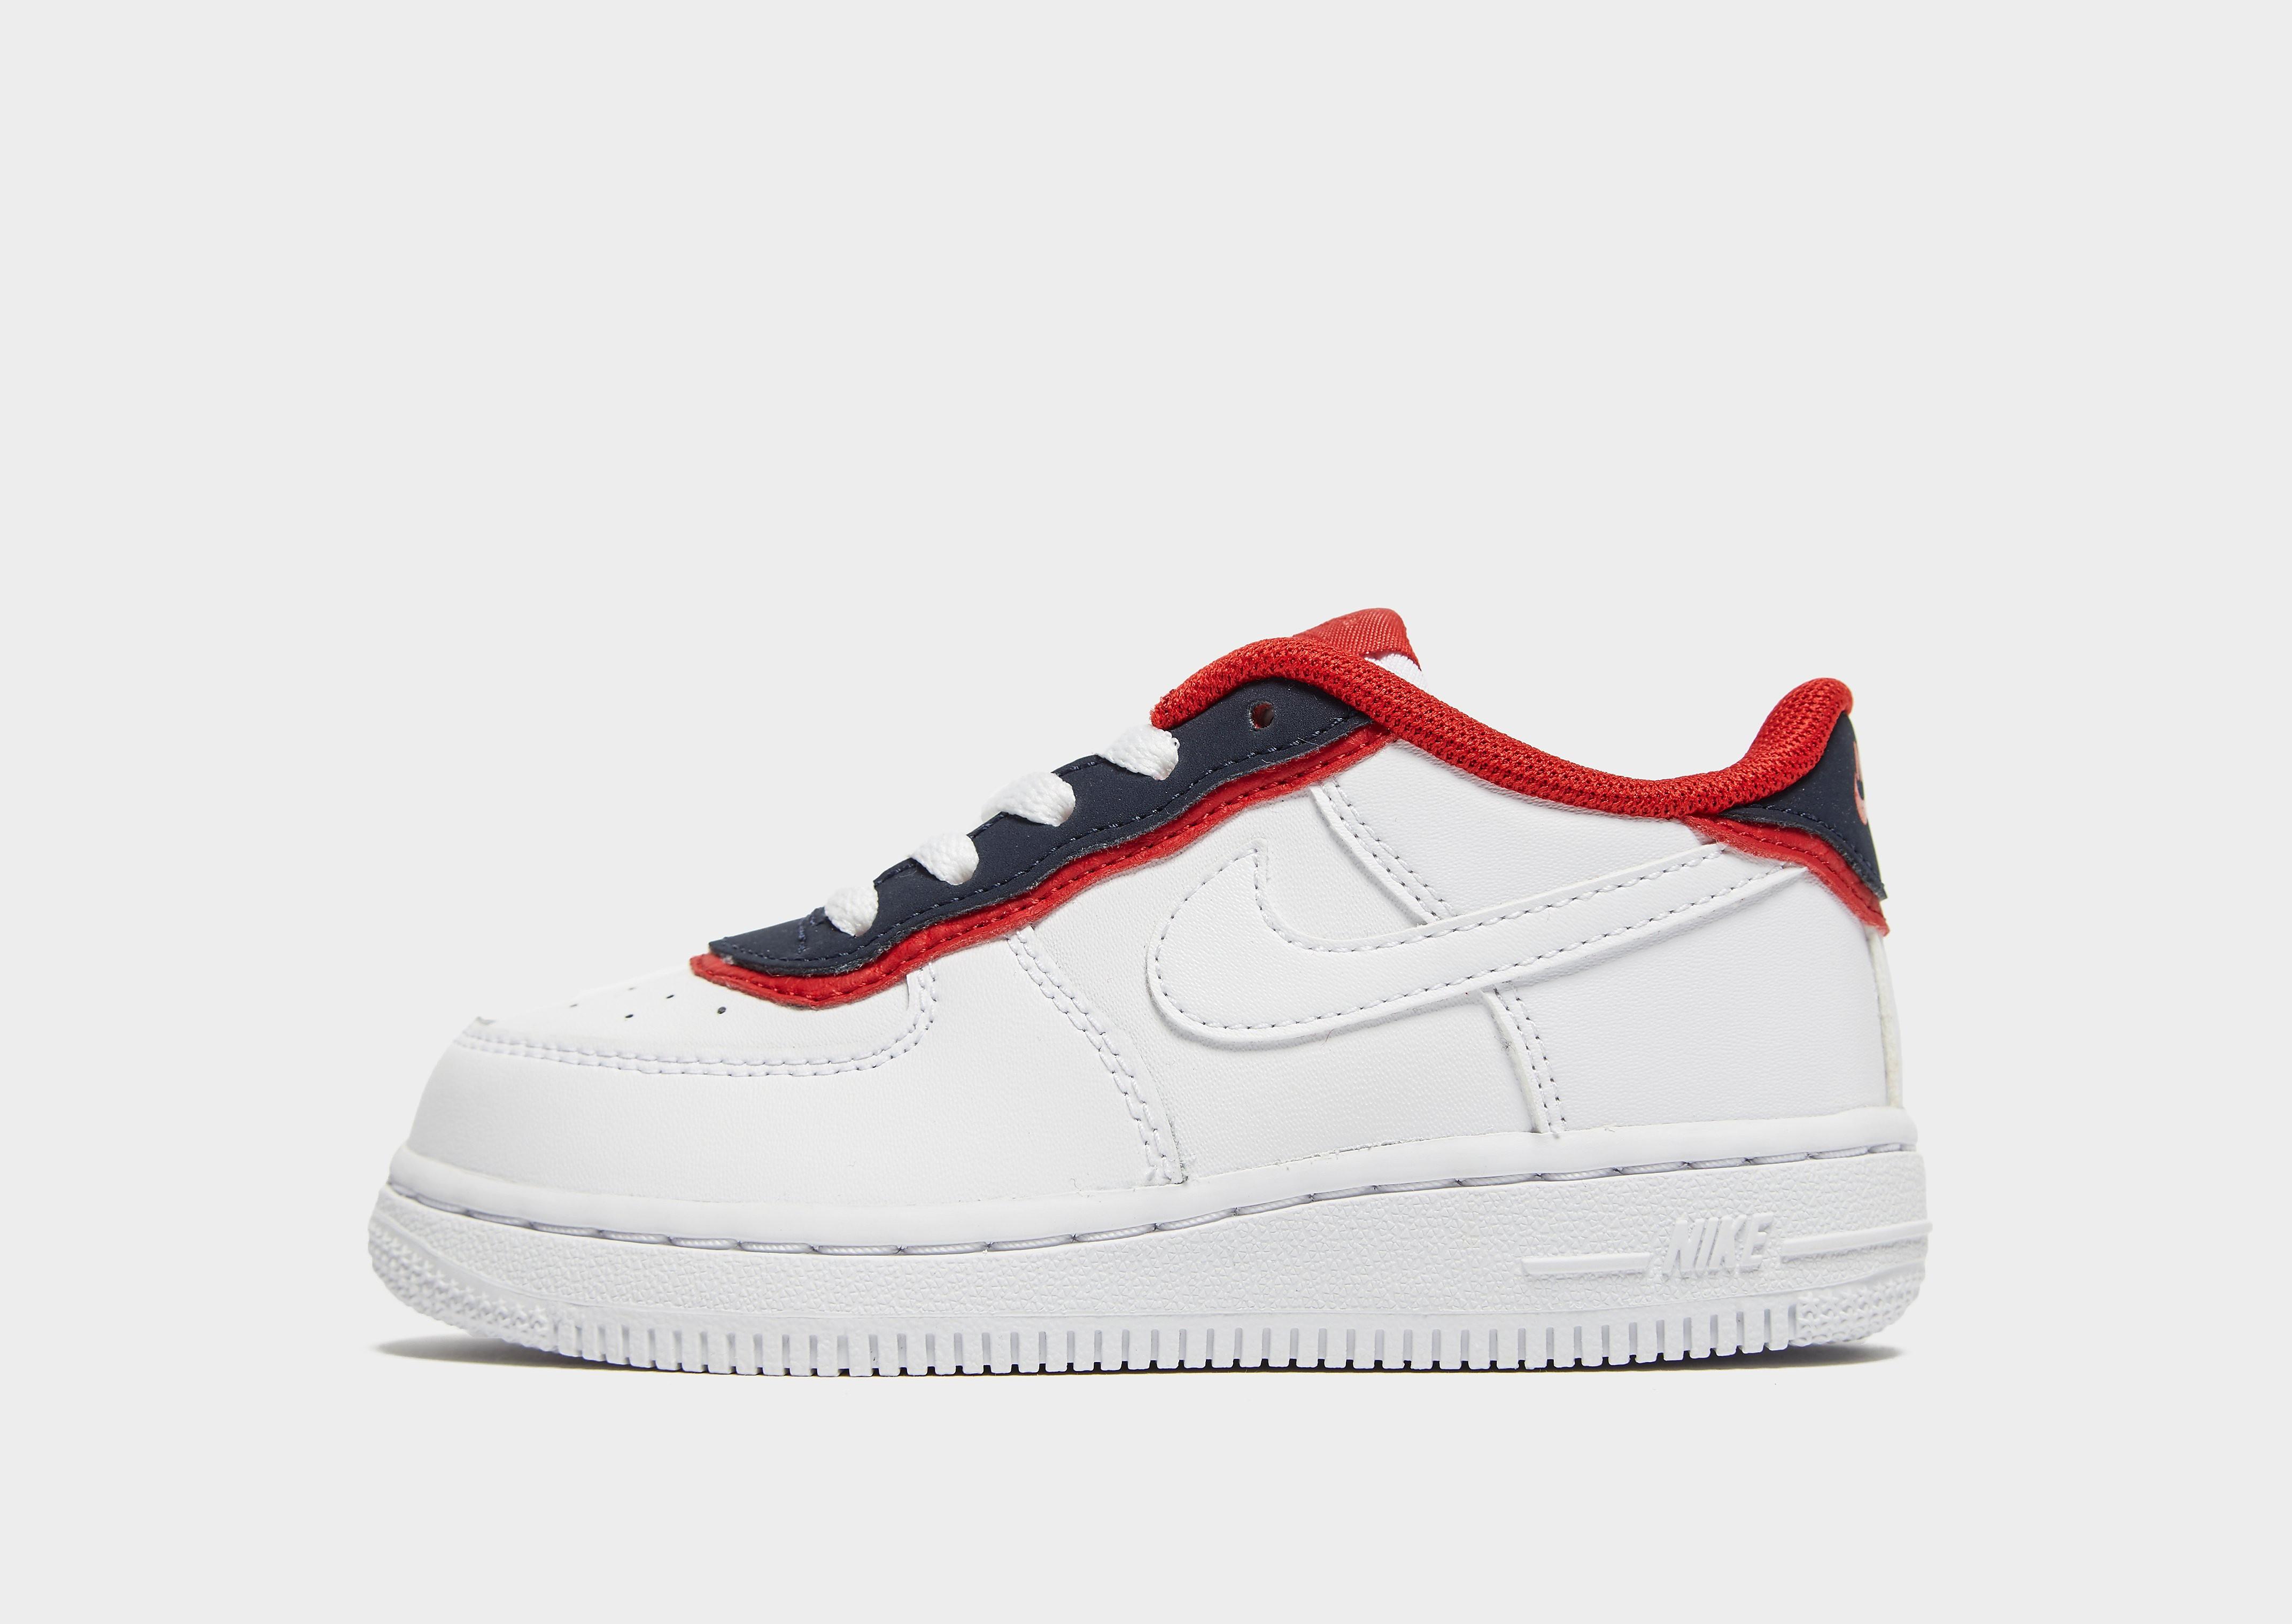 new style 33839 7eec4 Nike baby sneakers kopen? | +50 modellen Baby Nikes - theSneaker.nl